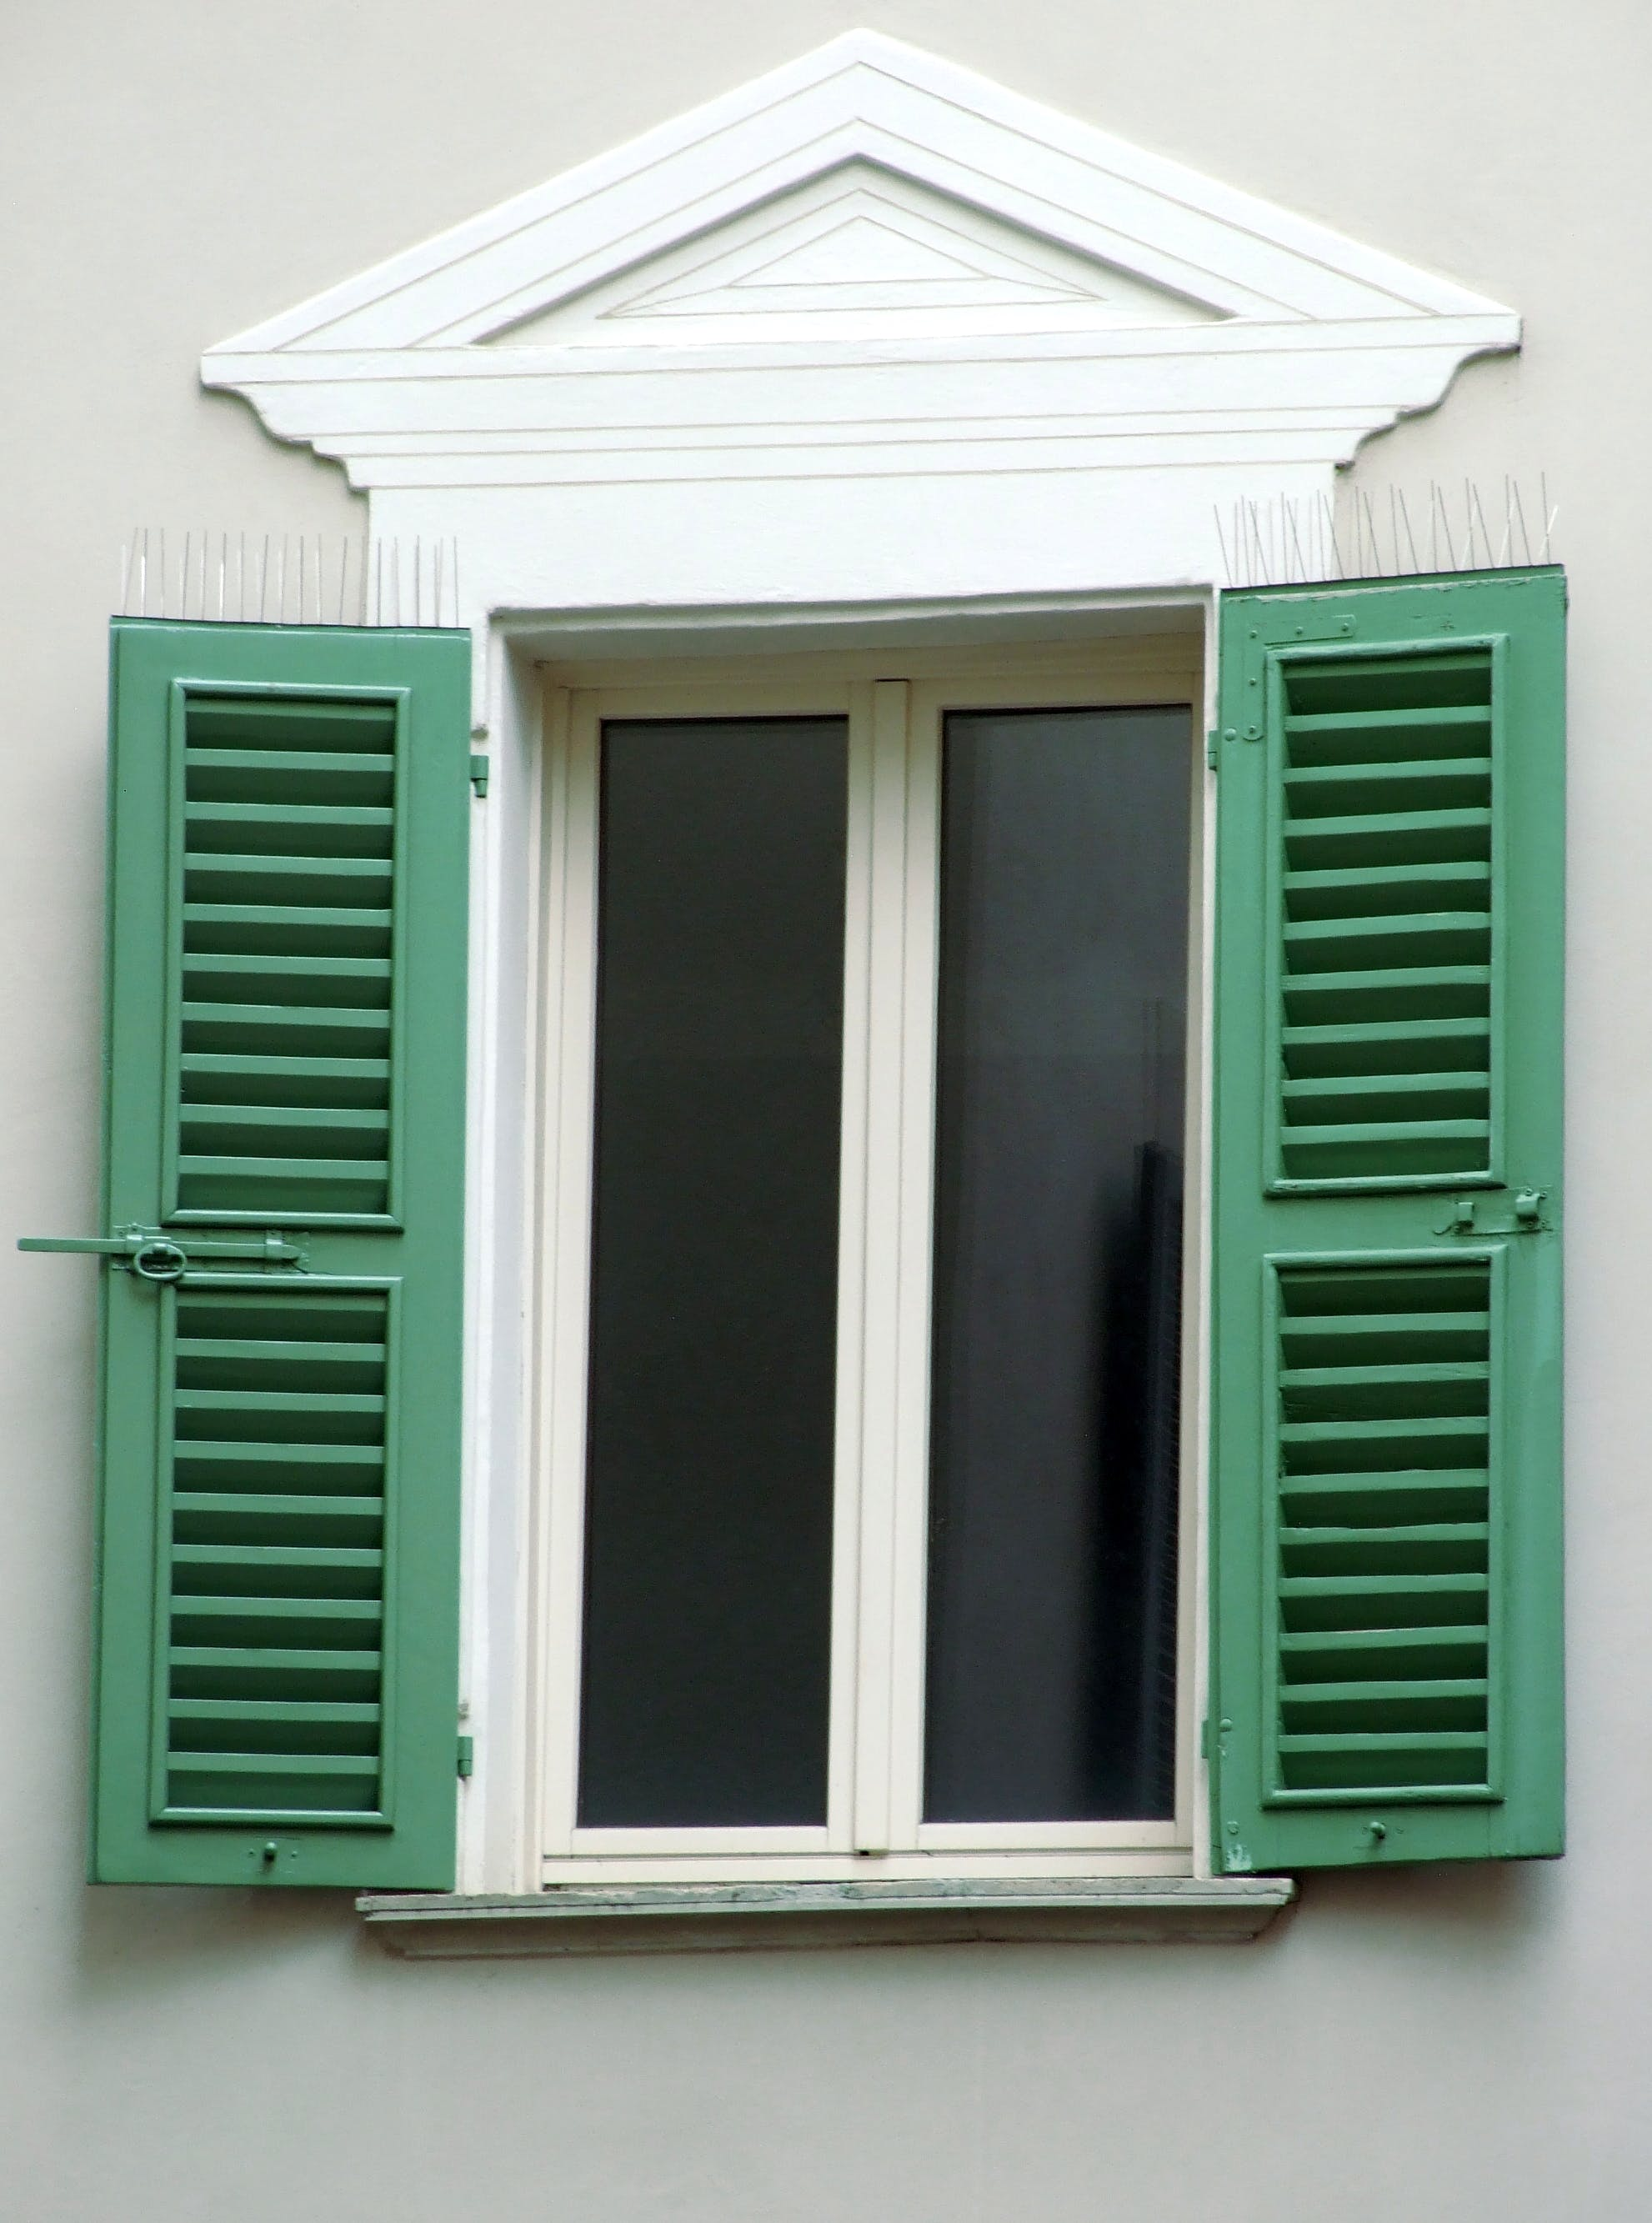 Free stock photo of window